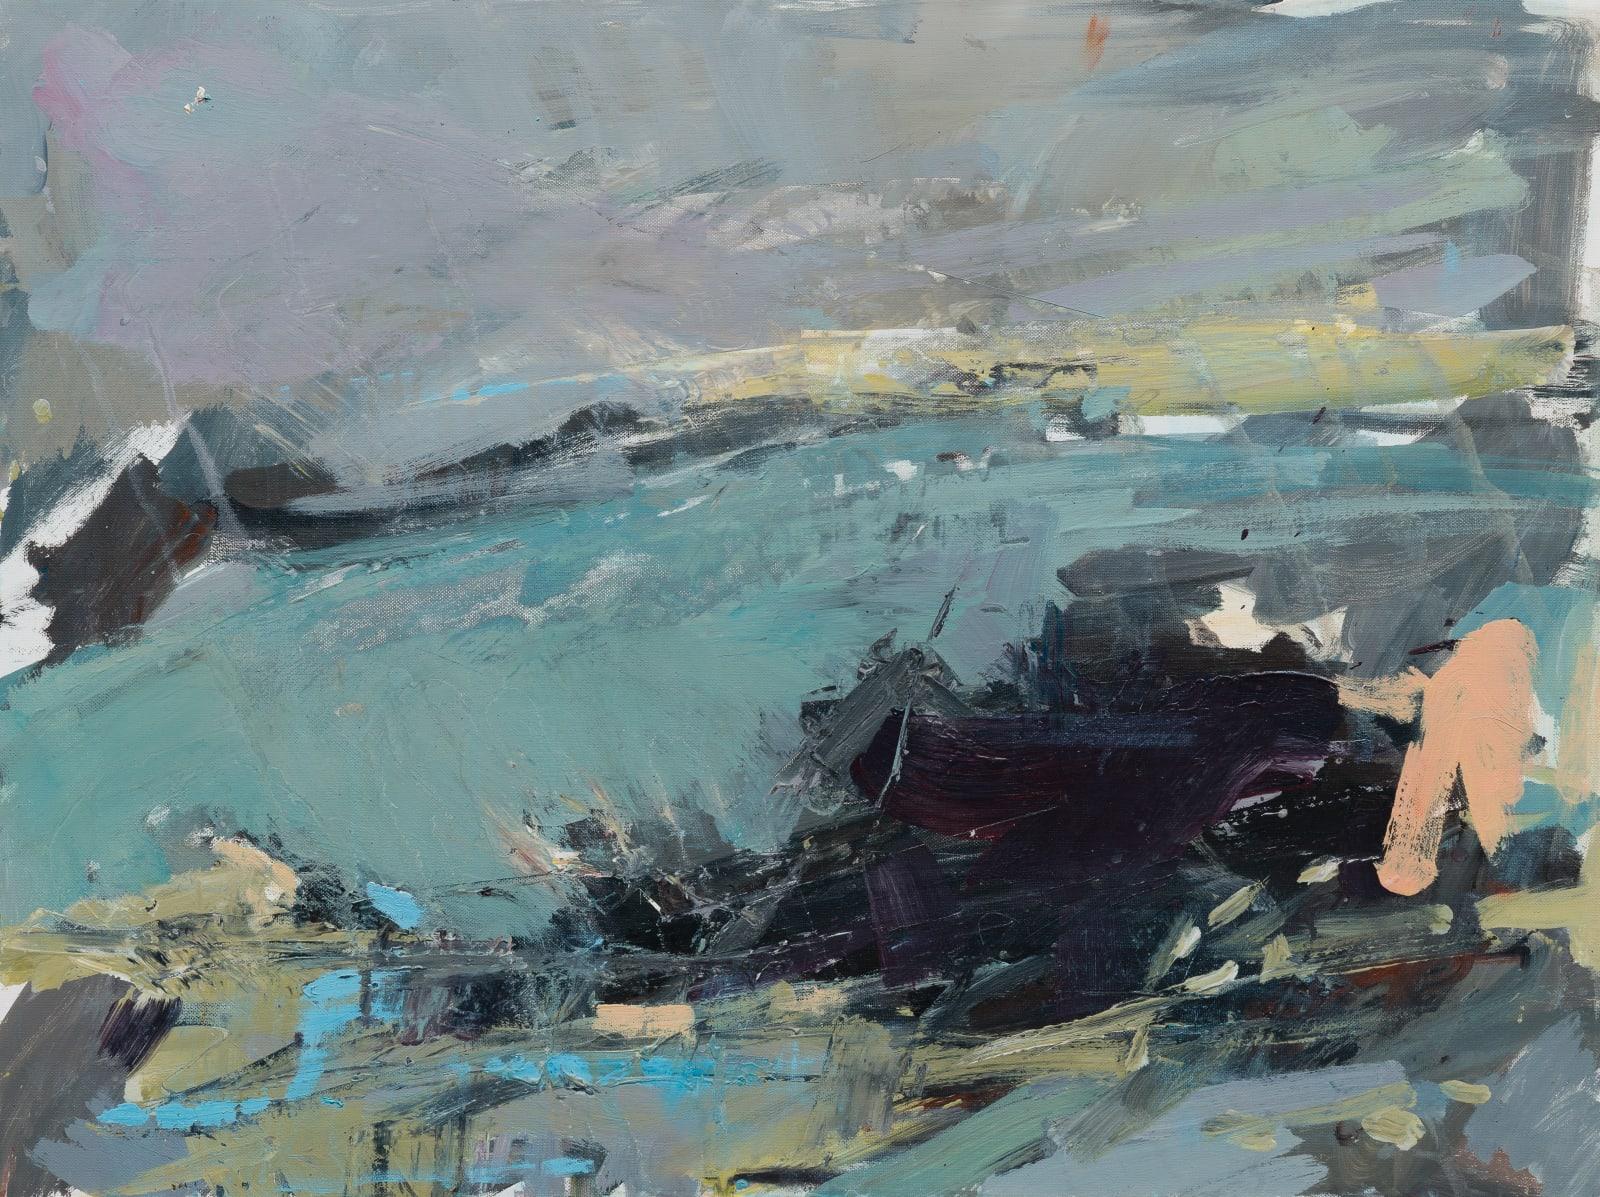 Paul Wadsworth, Cold Sea Green